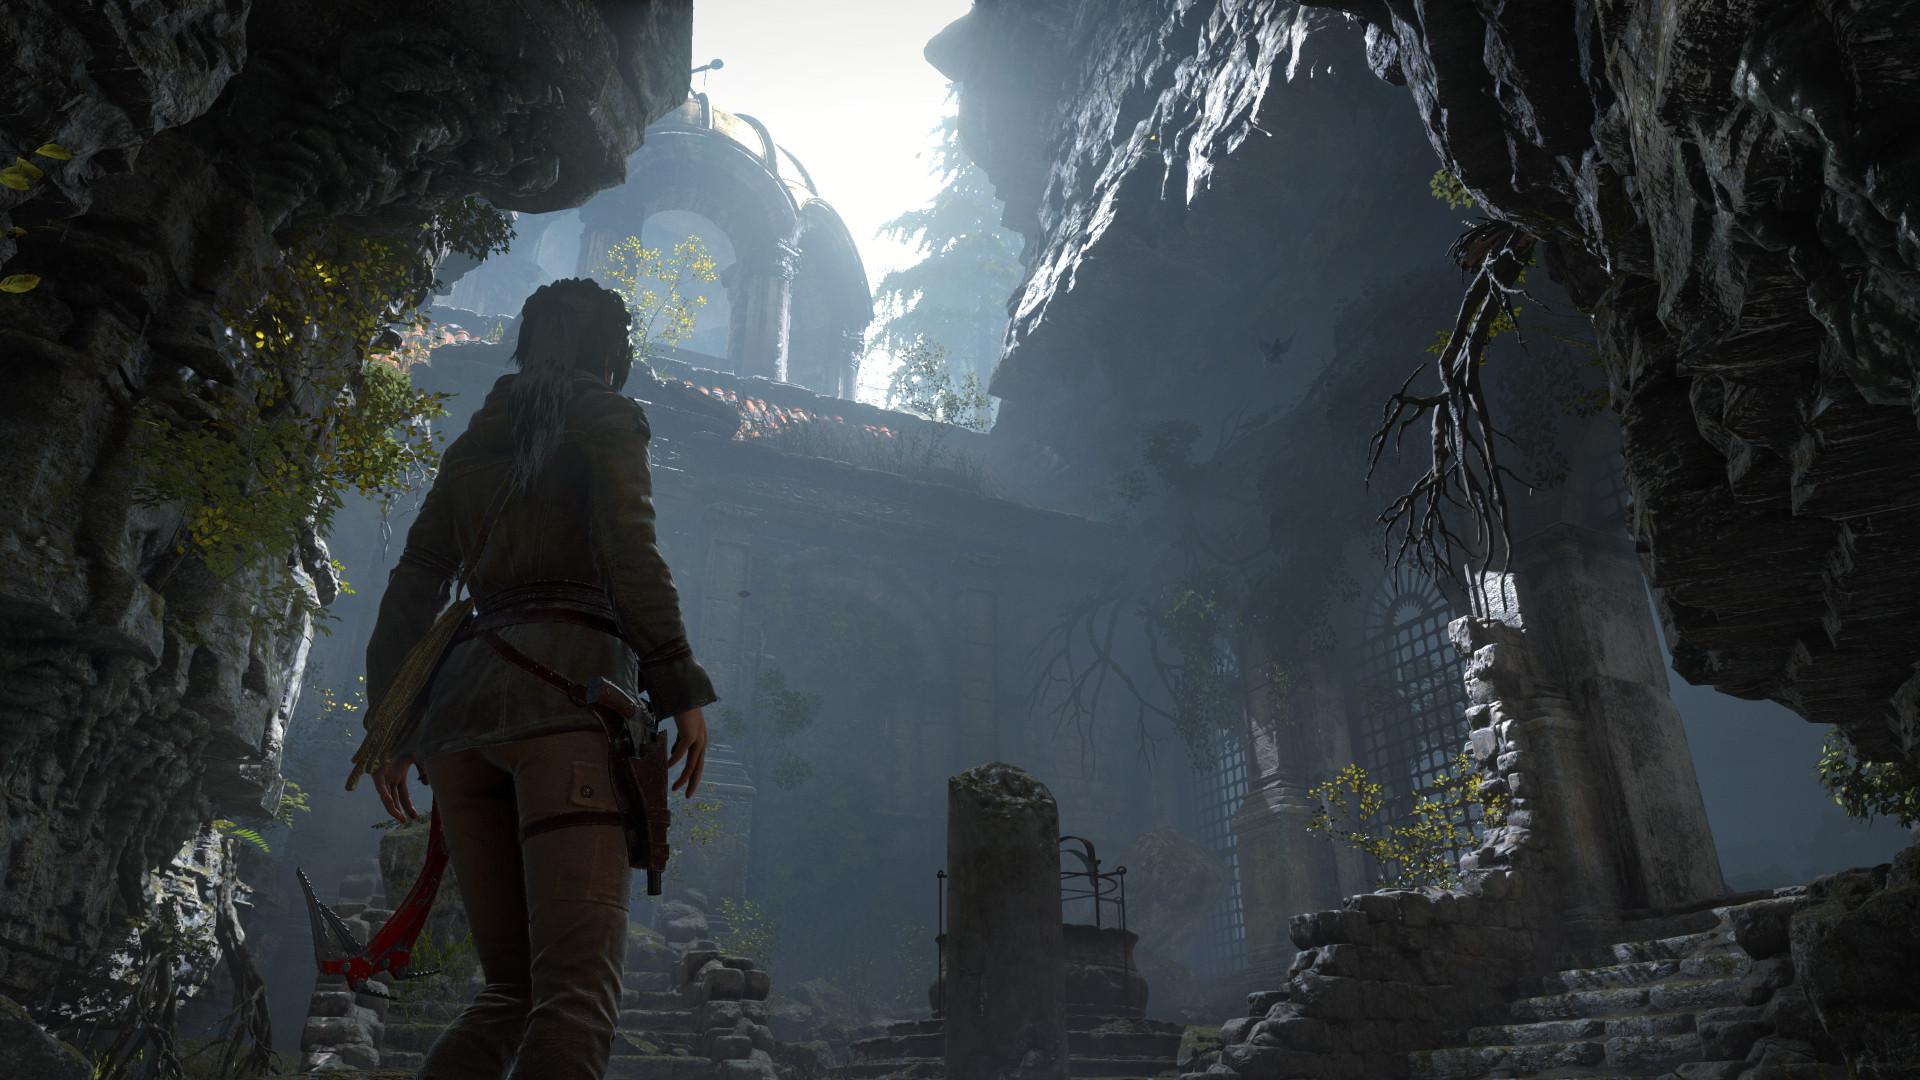 Rise Of The Tomb Raider ESPAÑOL Descargar Full (CPY) + REPACK 5 DVD5 (JPW) 4